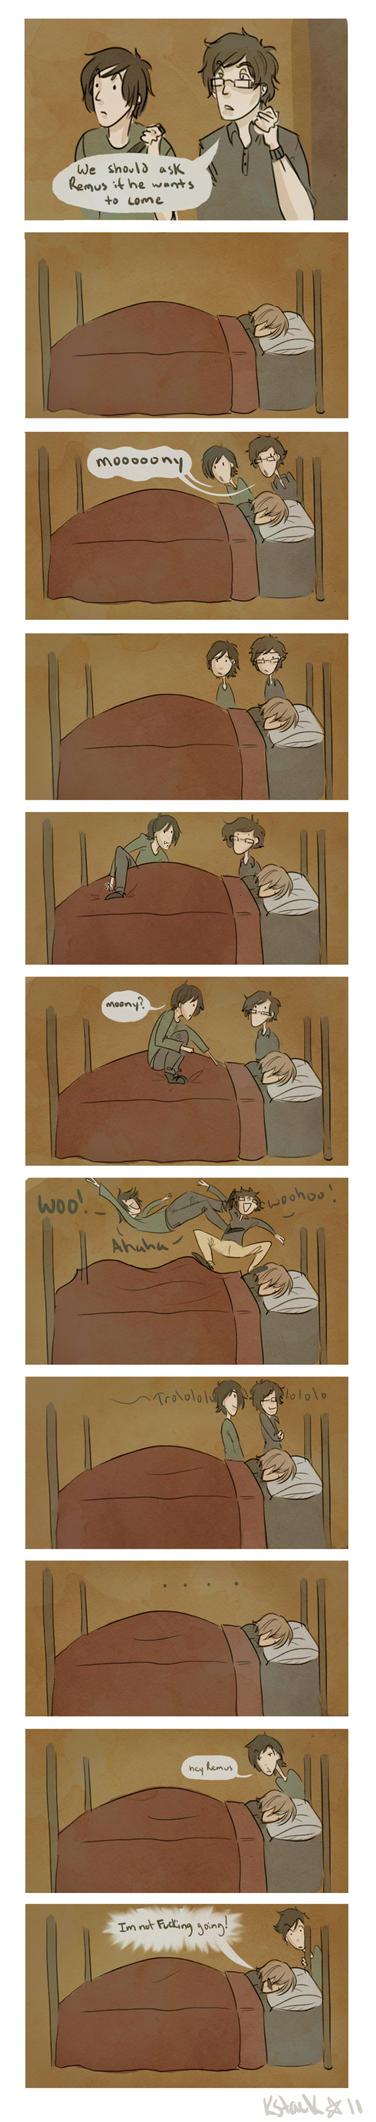 Hey Remus ... WAKE UP by Avender